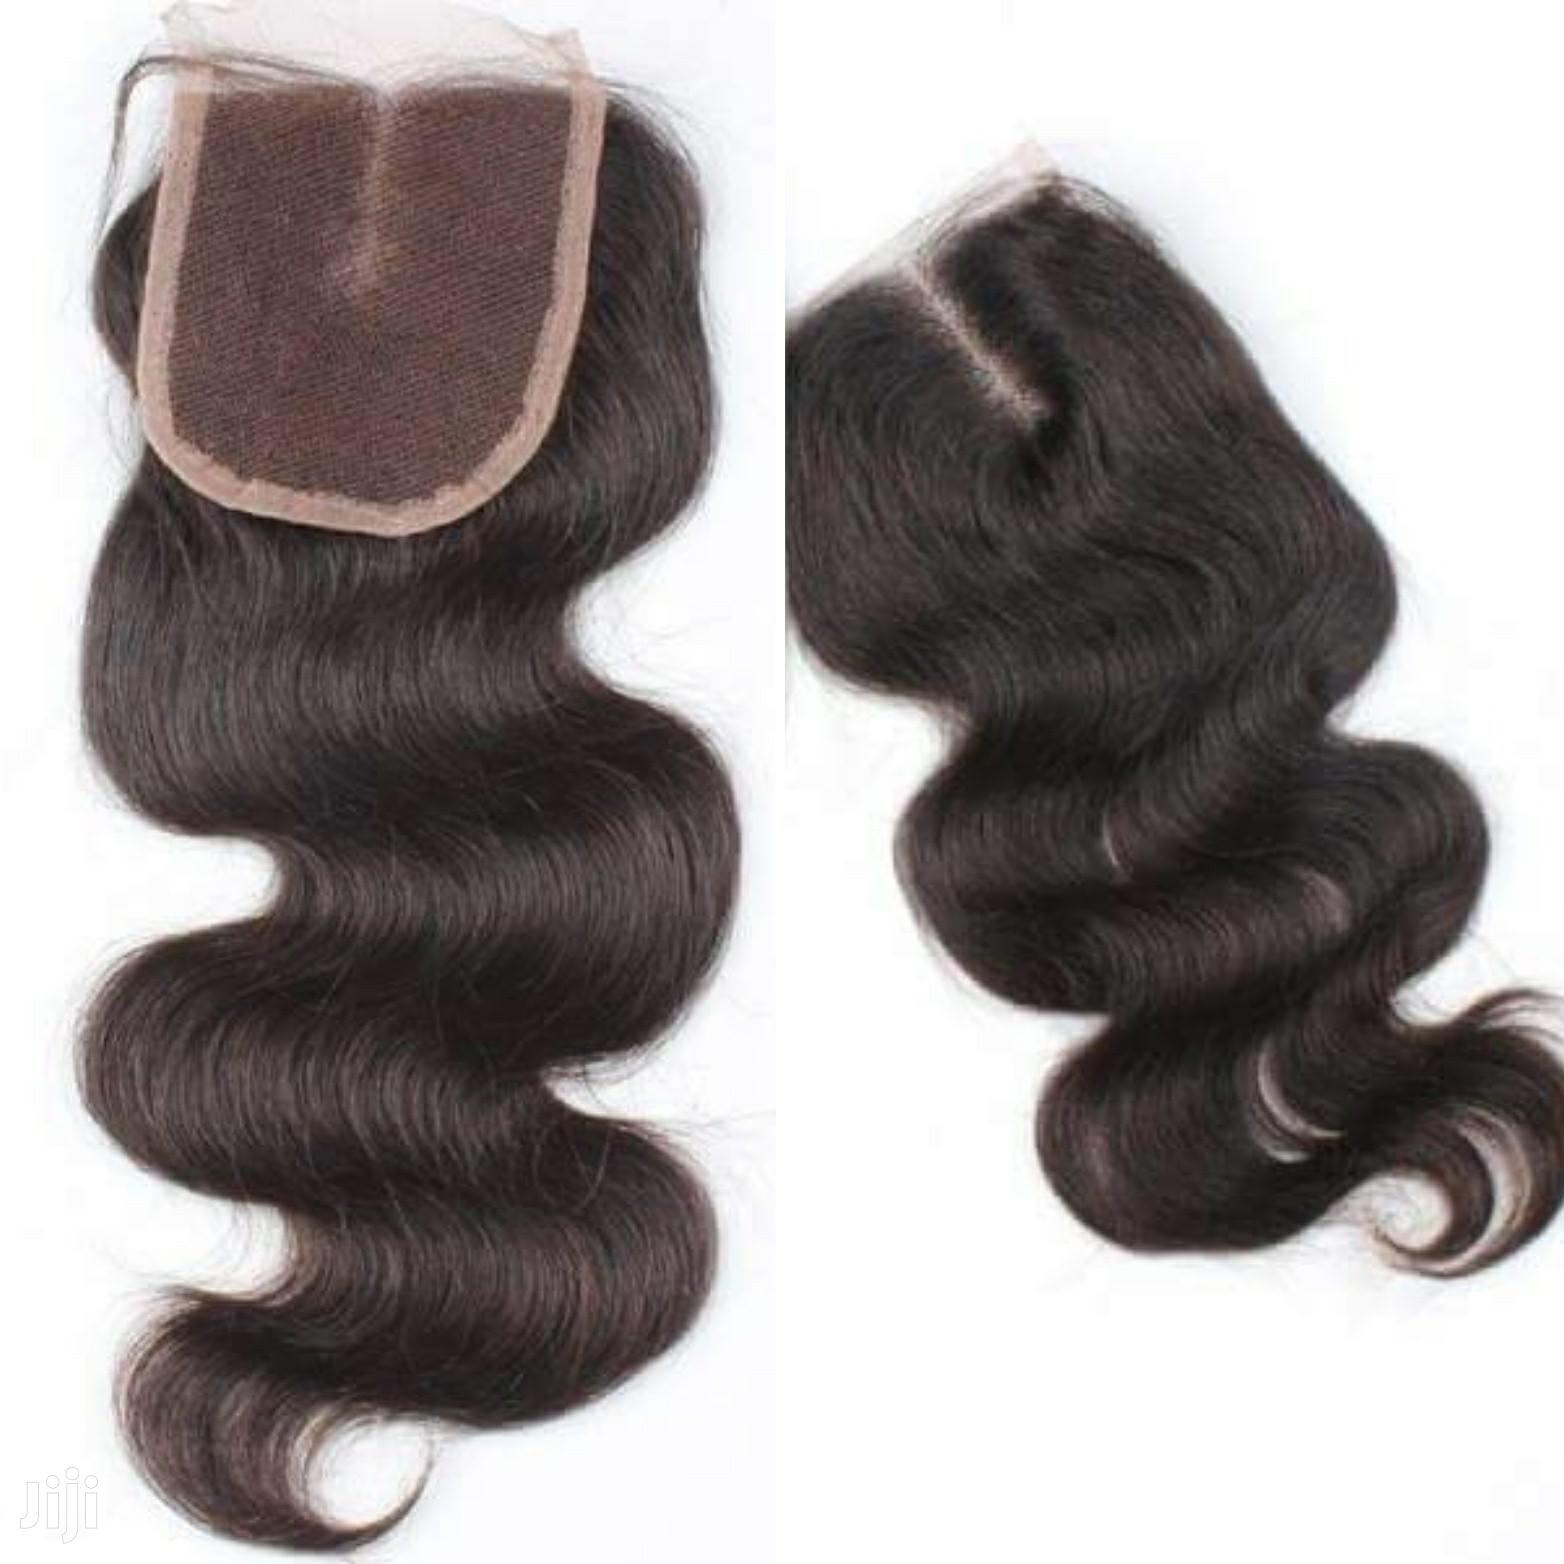 💯 Human Hair Closures